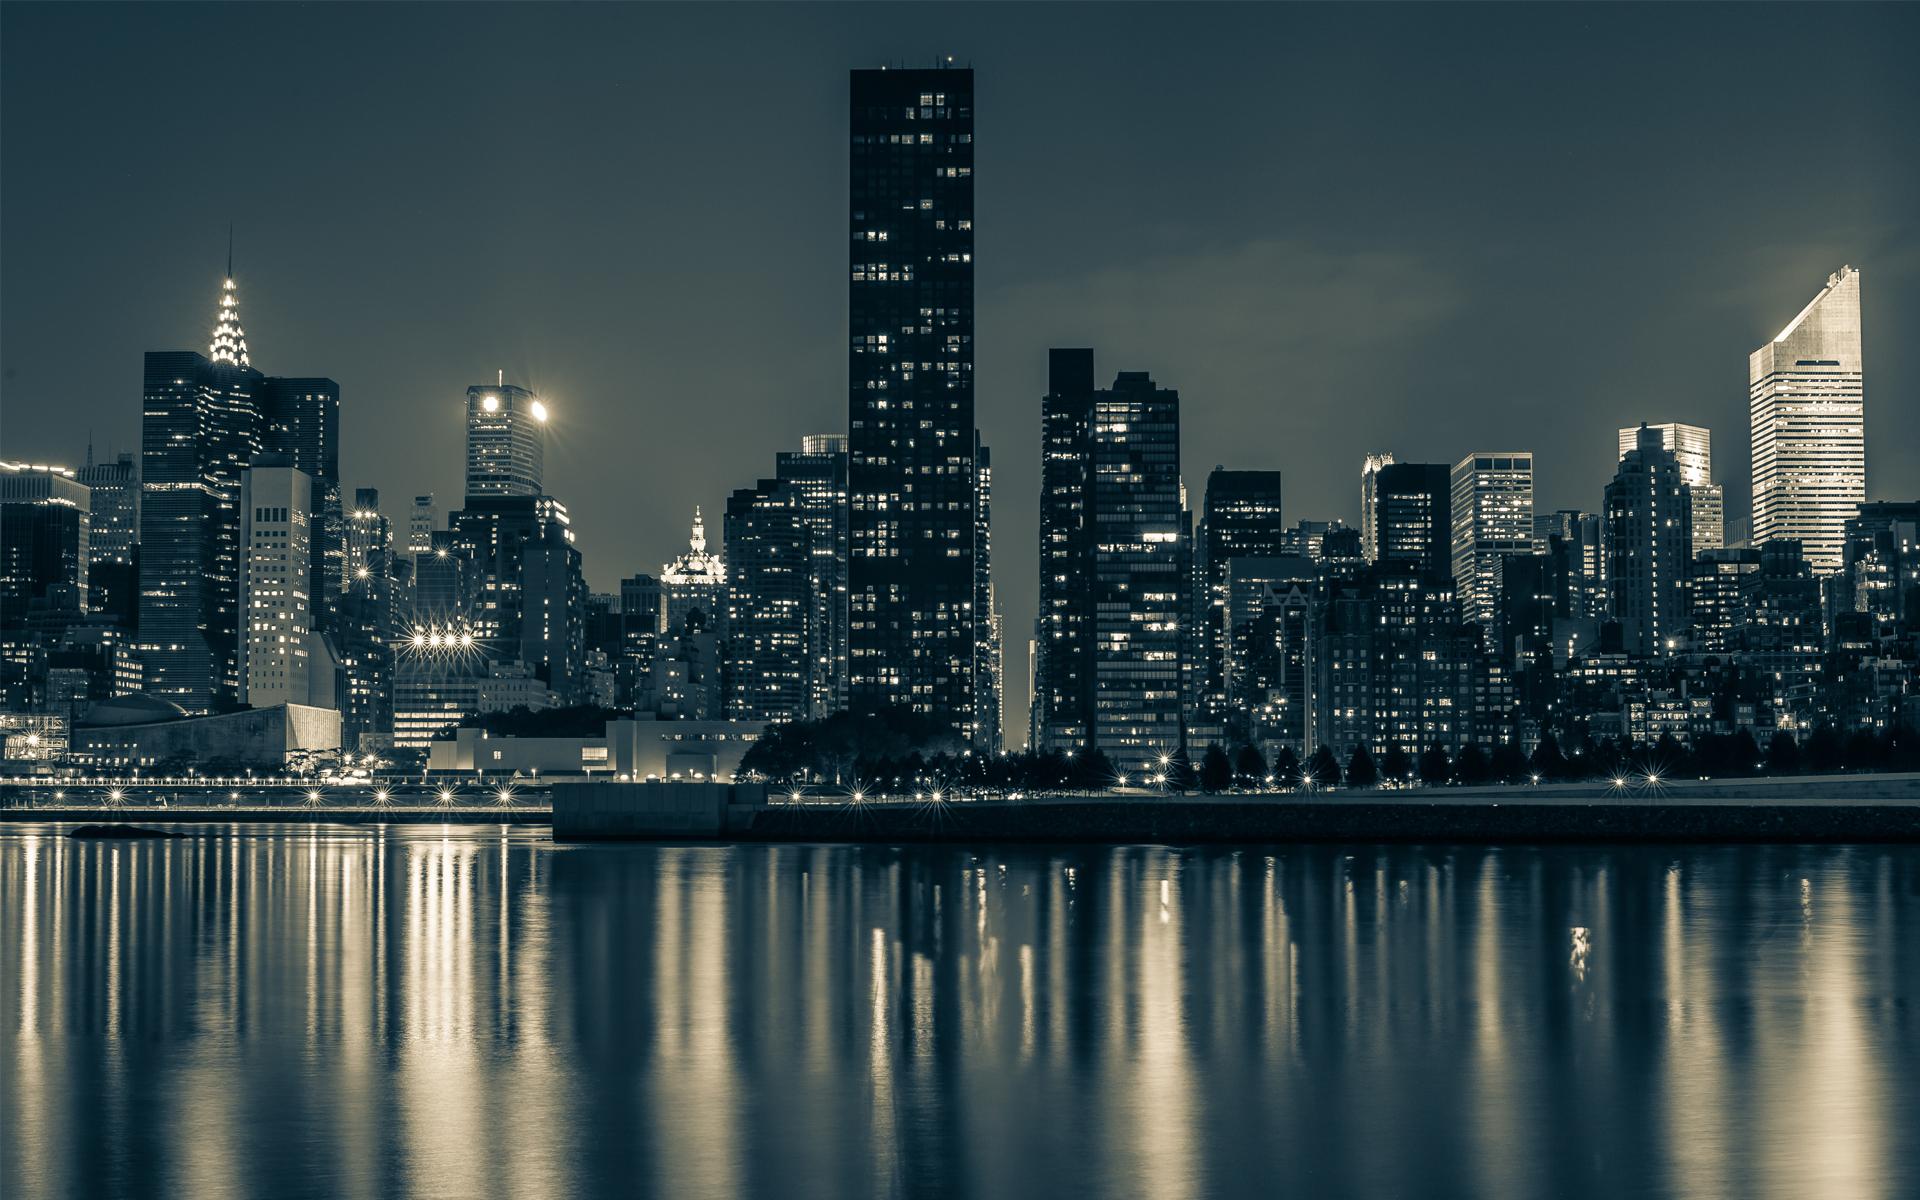 manhattan city new york new york city night water reflectionjpg 1920x1200